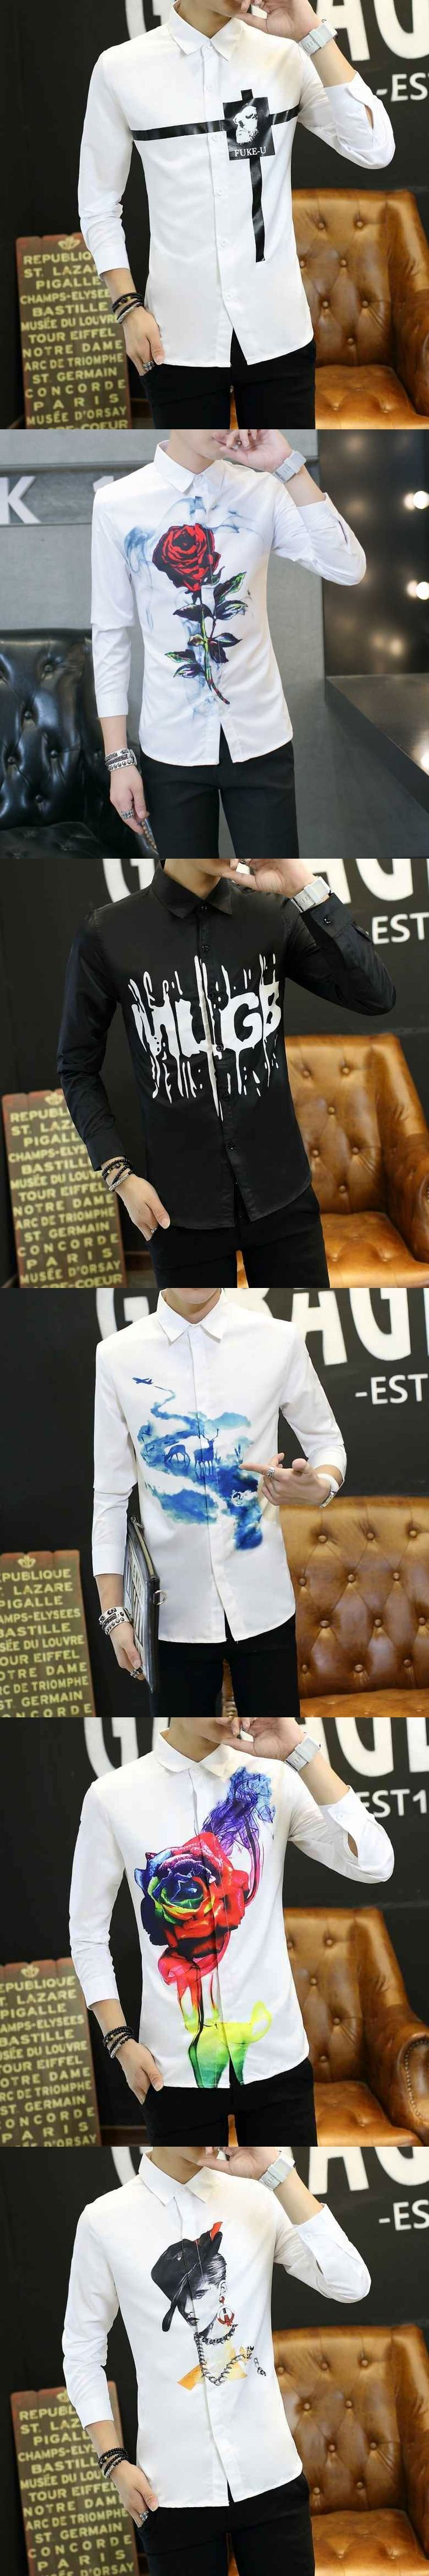 #2341 Spring 3D print Men shirt long sleeve Camisa social Preppy Style Lightweight Mens dress shirts Camisa social masculina